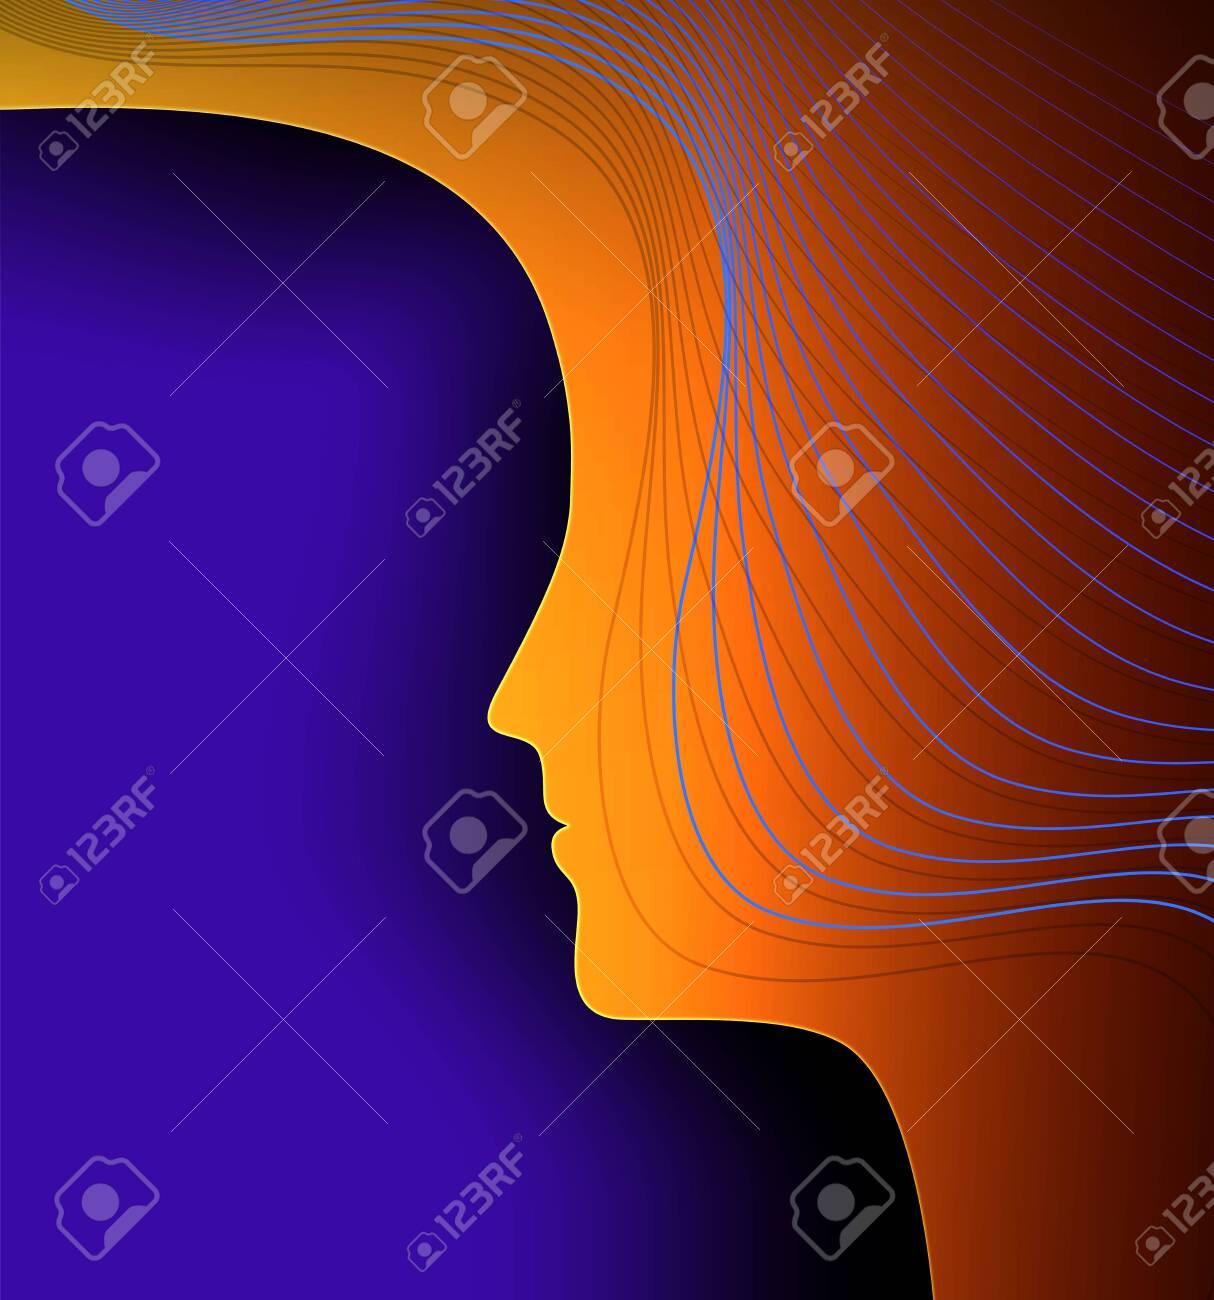 woman profile, technology and human concept, woman psyhology creative idea, vector - 143357889